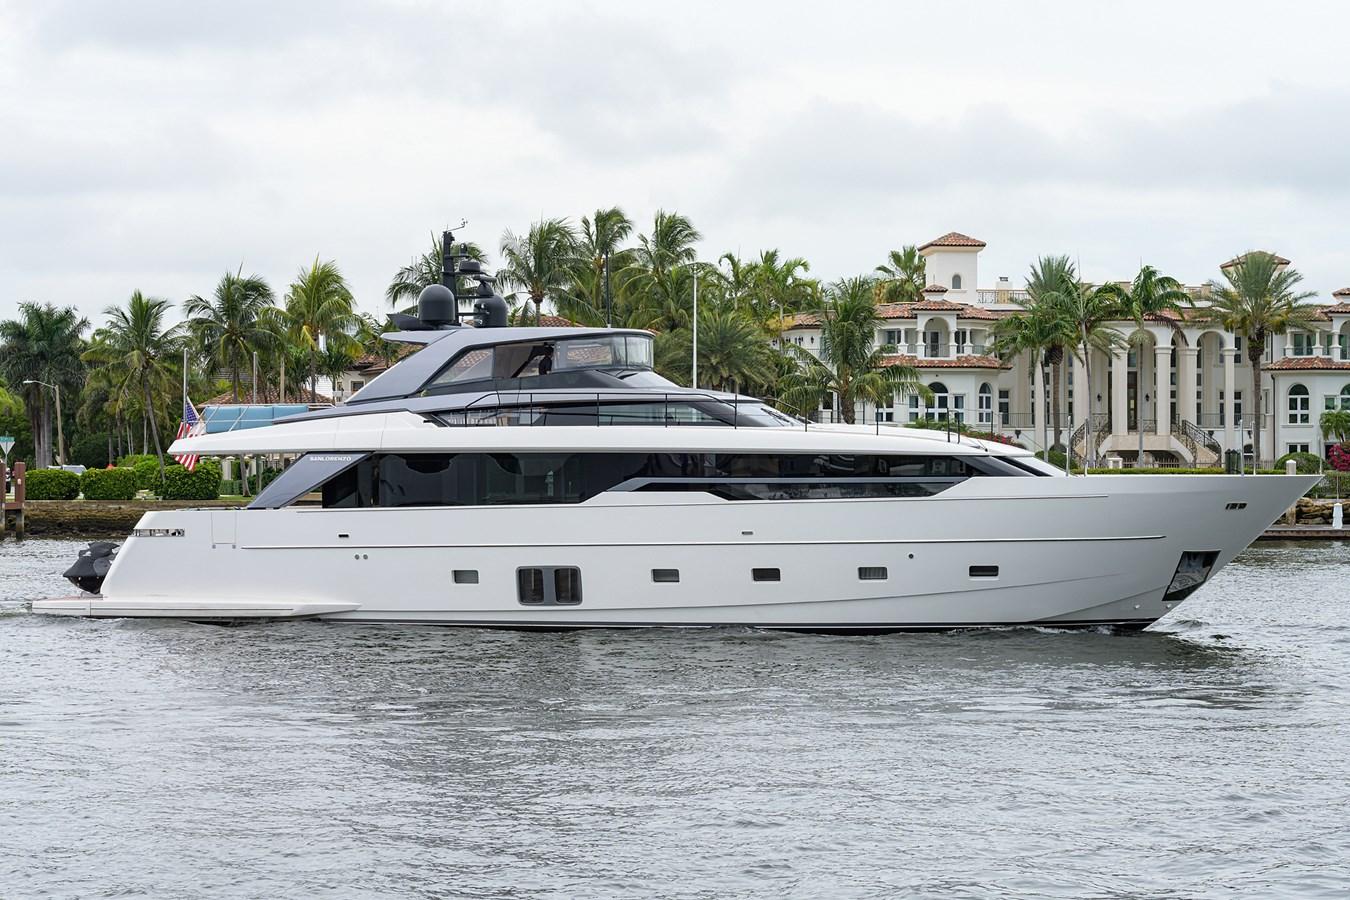 NiniPop XL yacht for sale